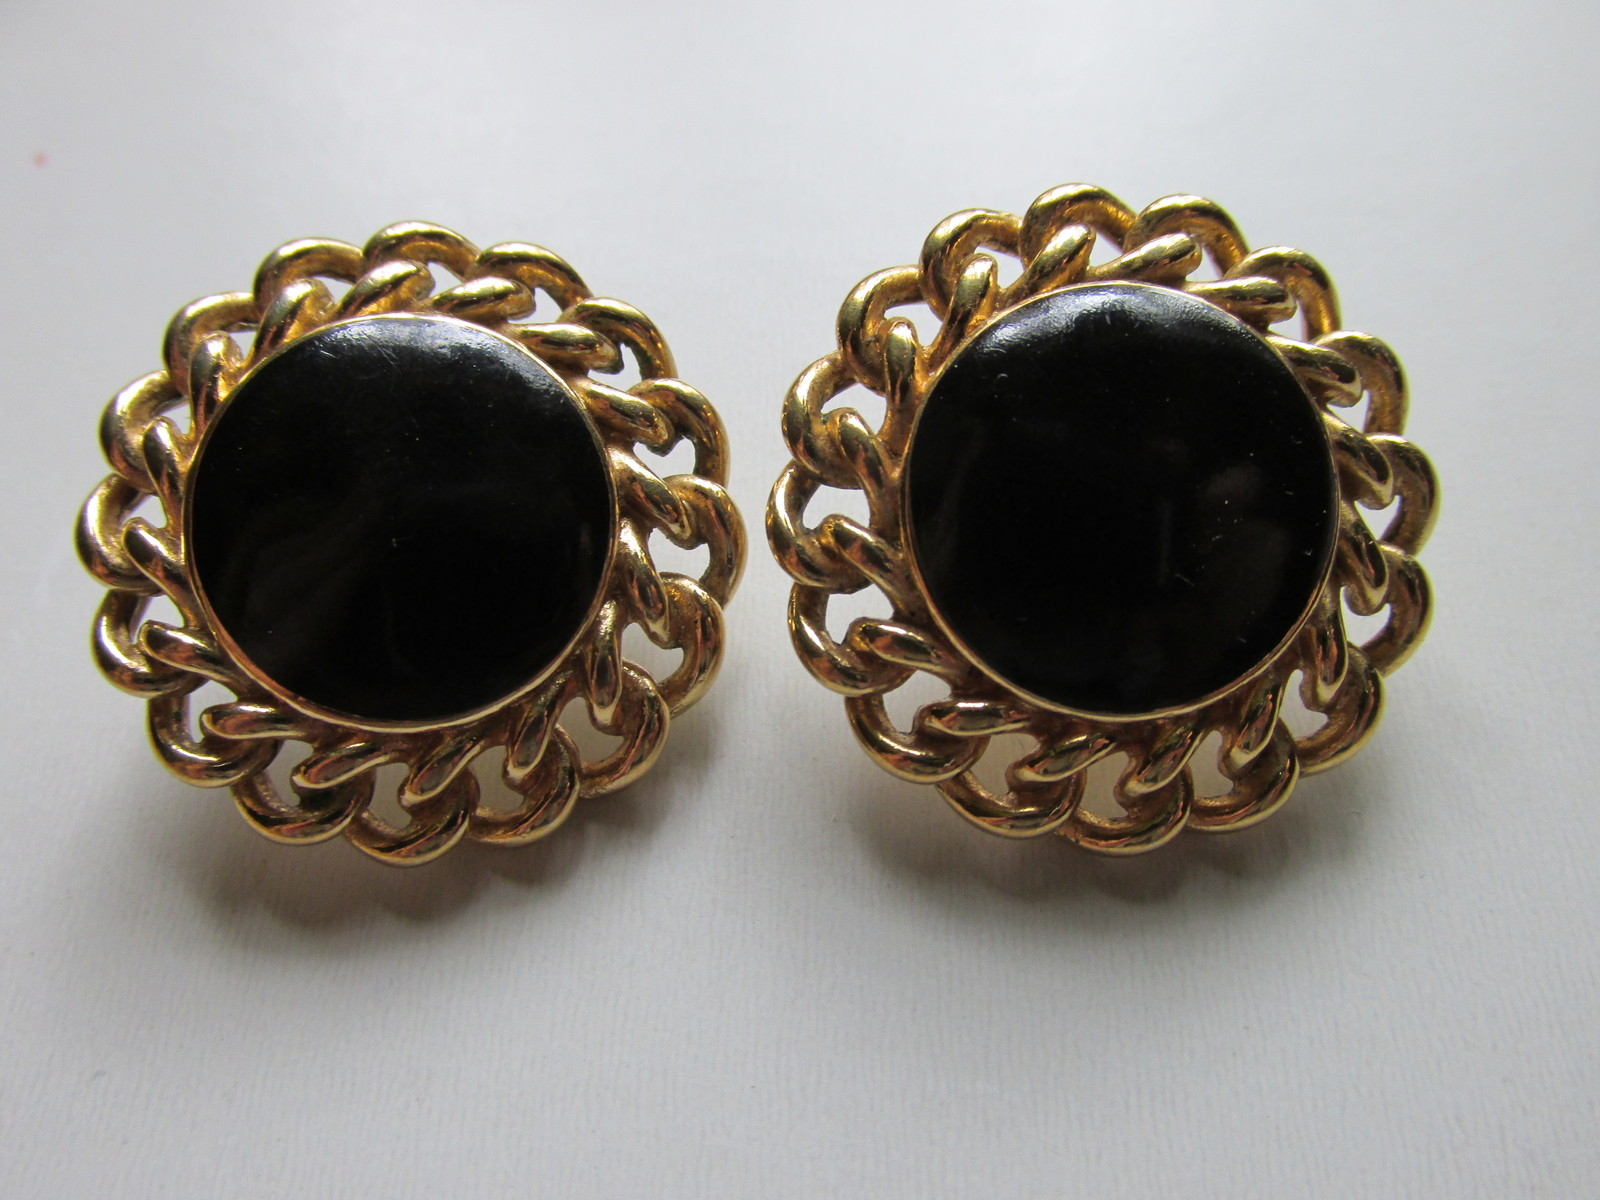 Vintage / Retro Black Enameled Monet Choker & Pierced Earrings Set